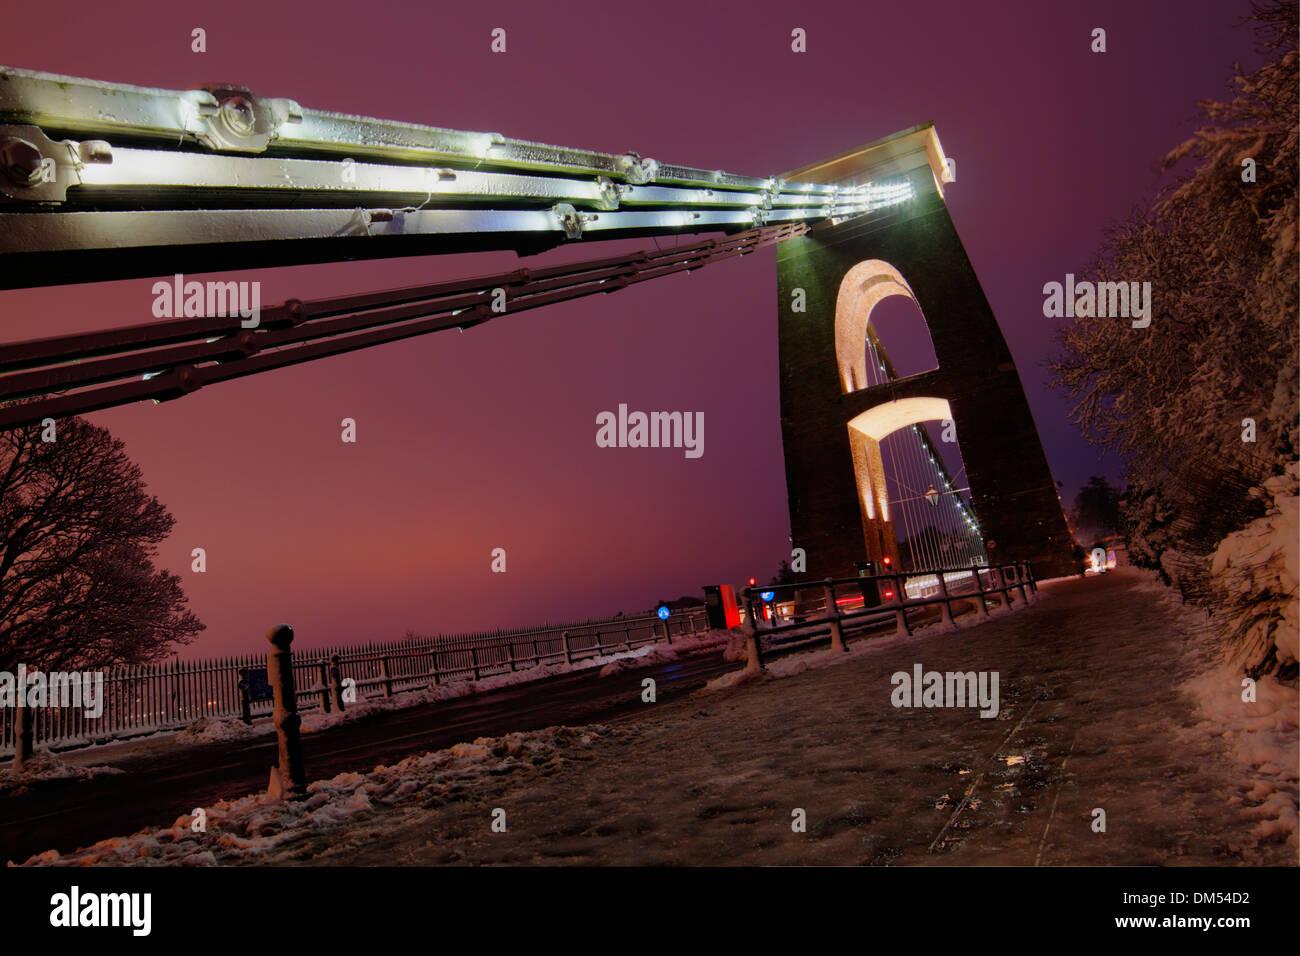 Clifton Suspension Bridge in the snow. Bristol, January 2013. - Stock Image